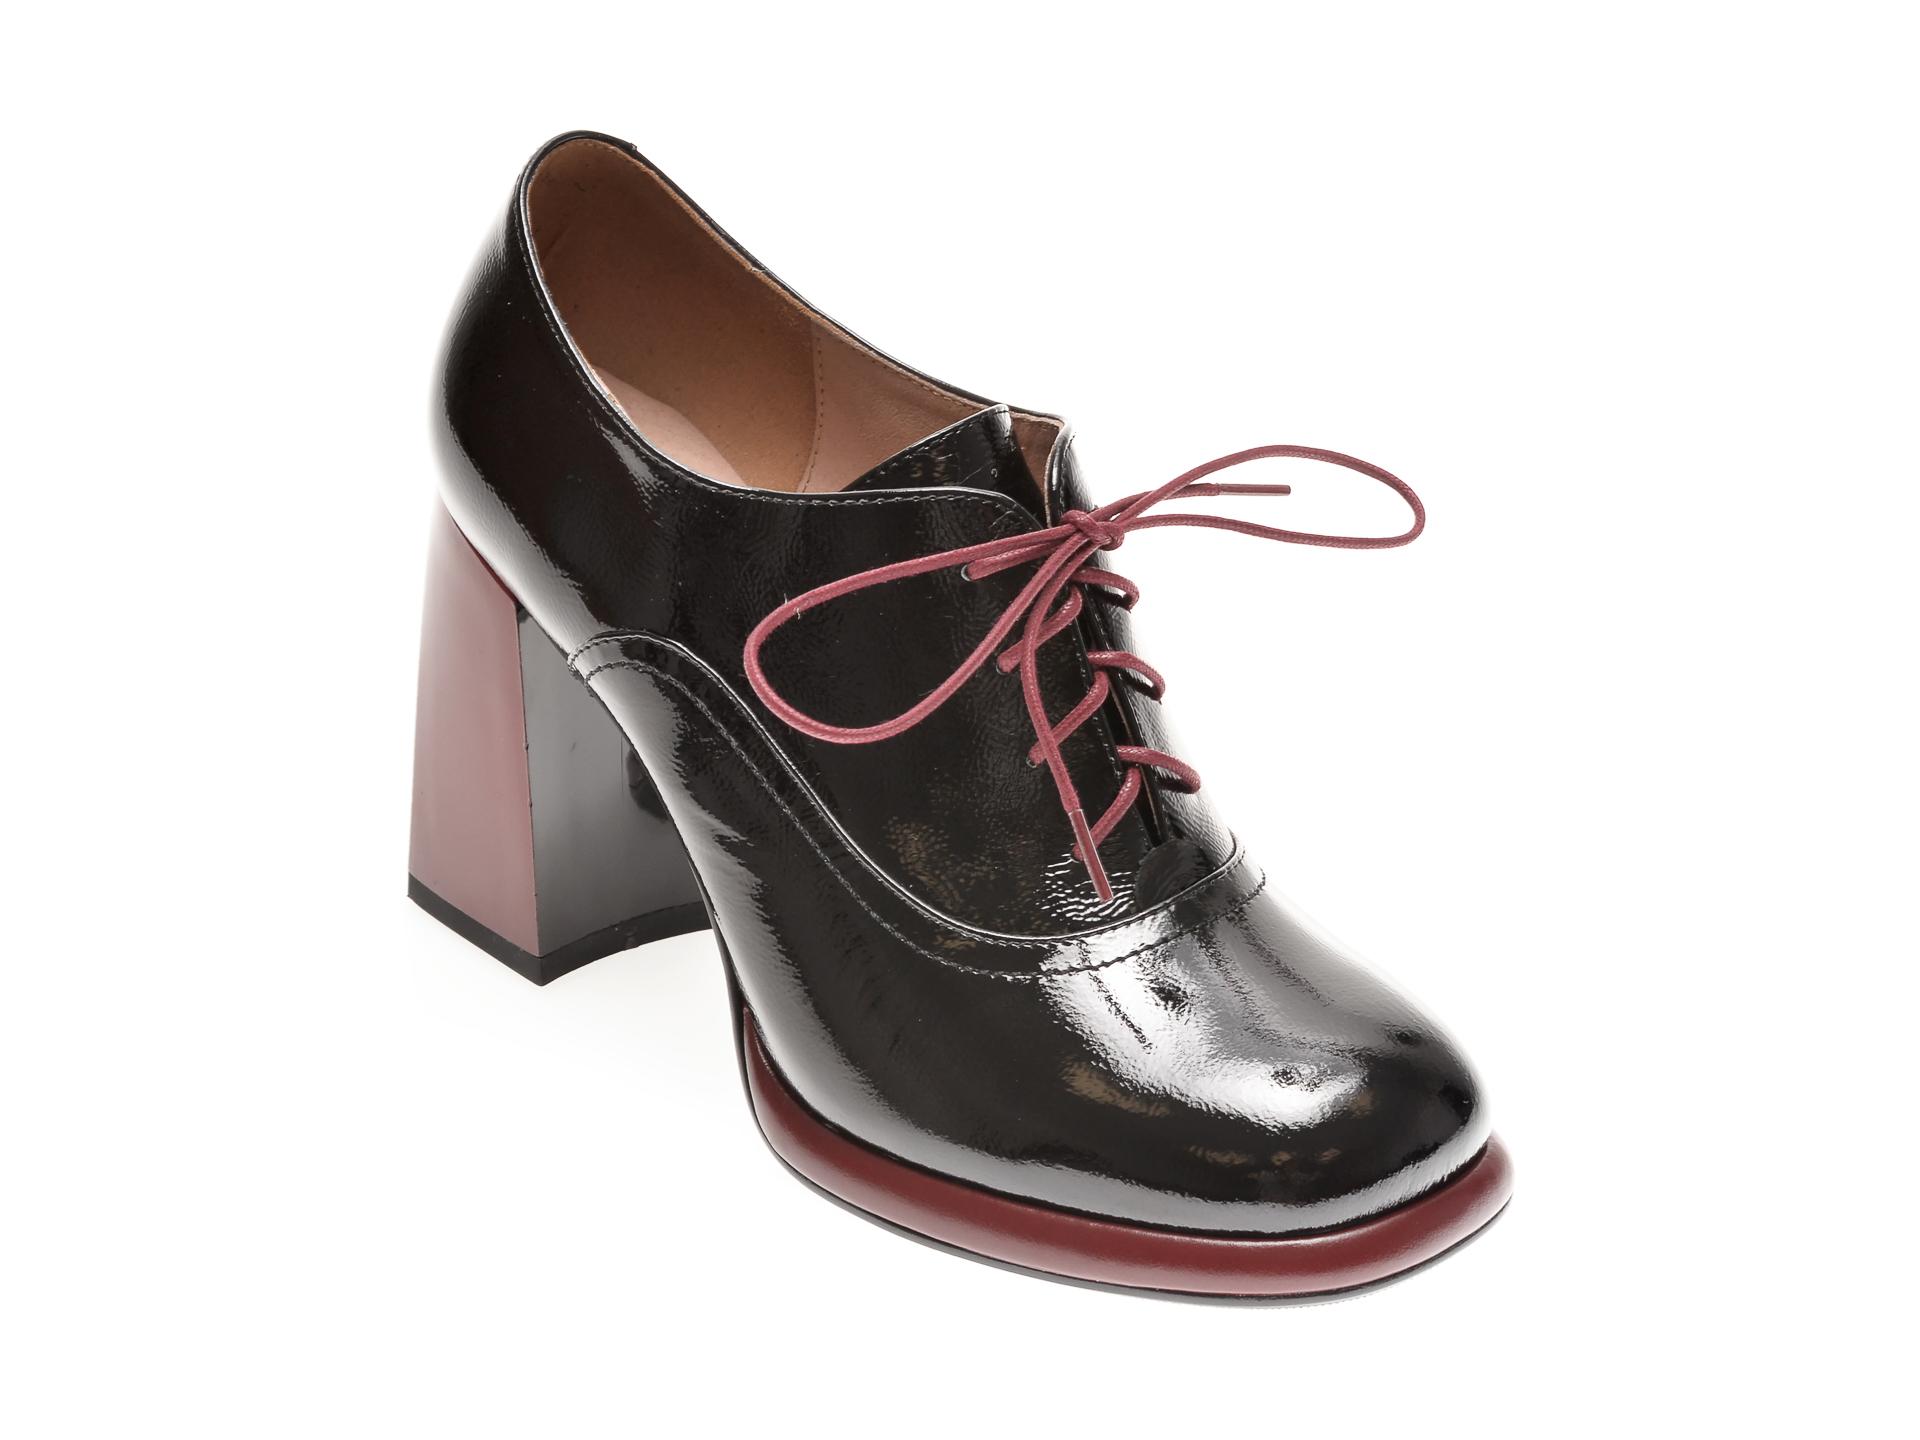 Pantofi EPICA negri, H657722, din piele naturala lacuita imagine